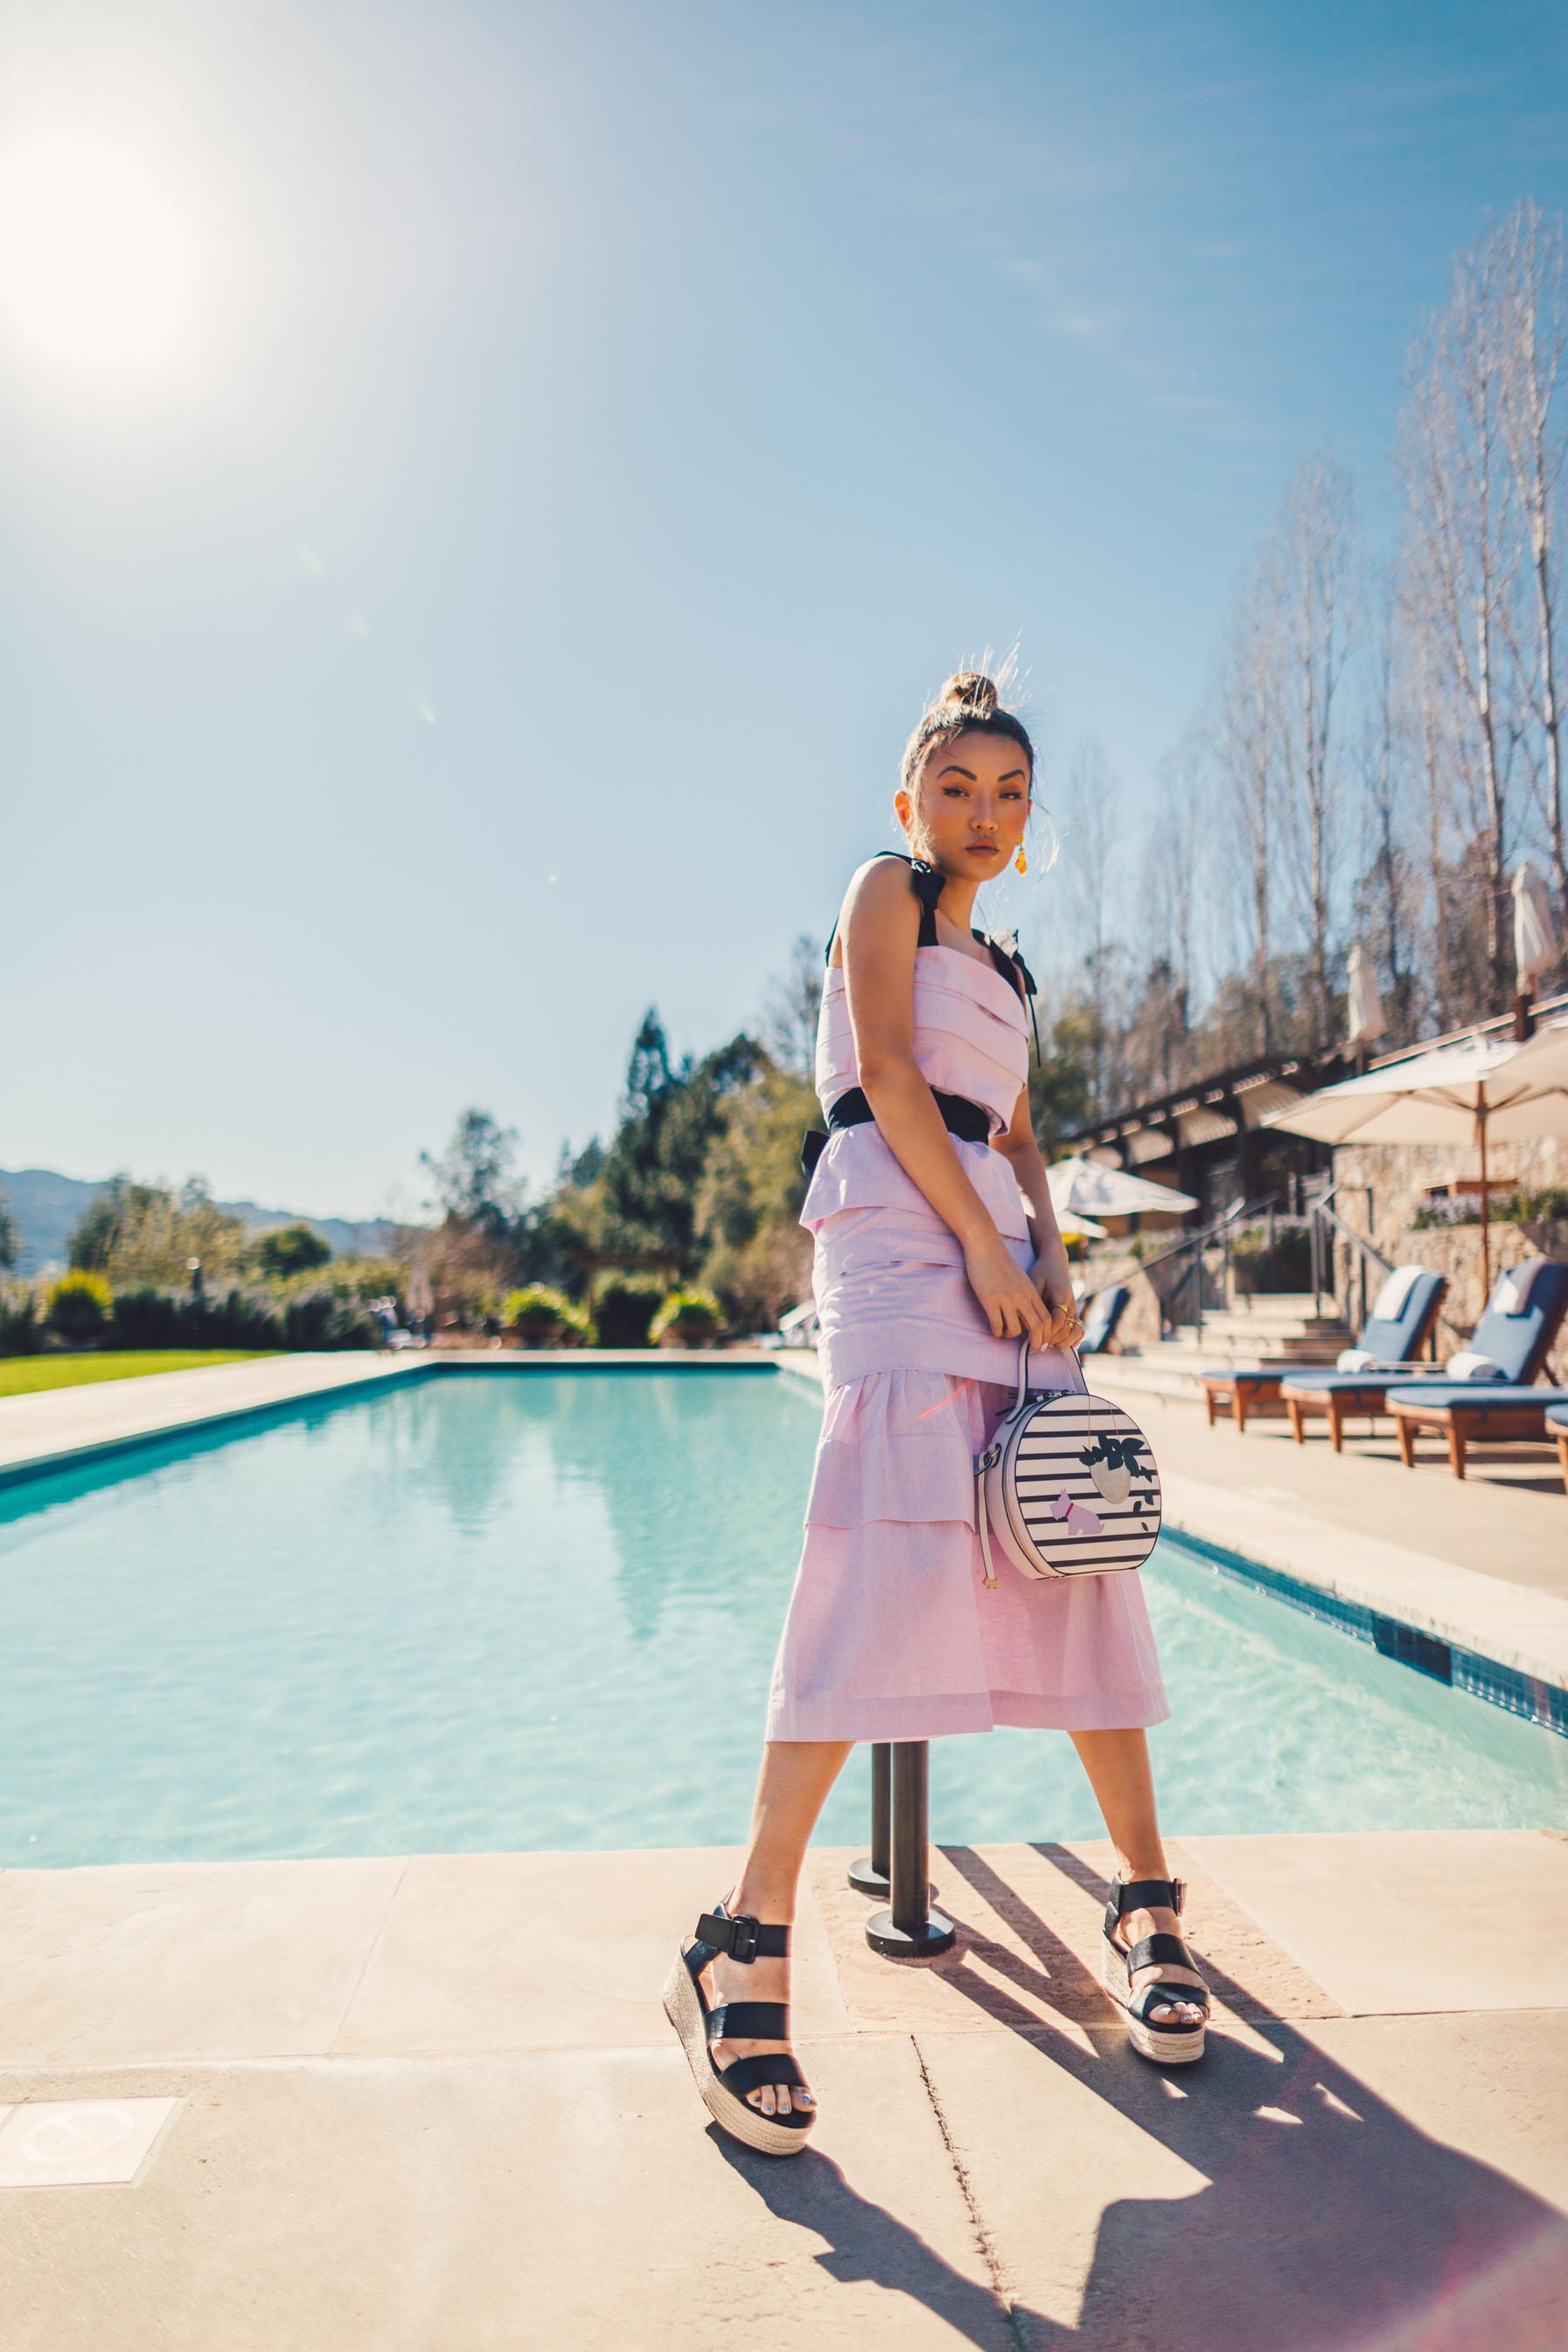 summer fashion trends 2019, chic summer outfit, ruffle skirt set, espadrille sandals // Notjessfashion.com